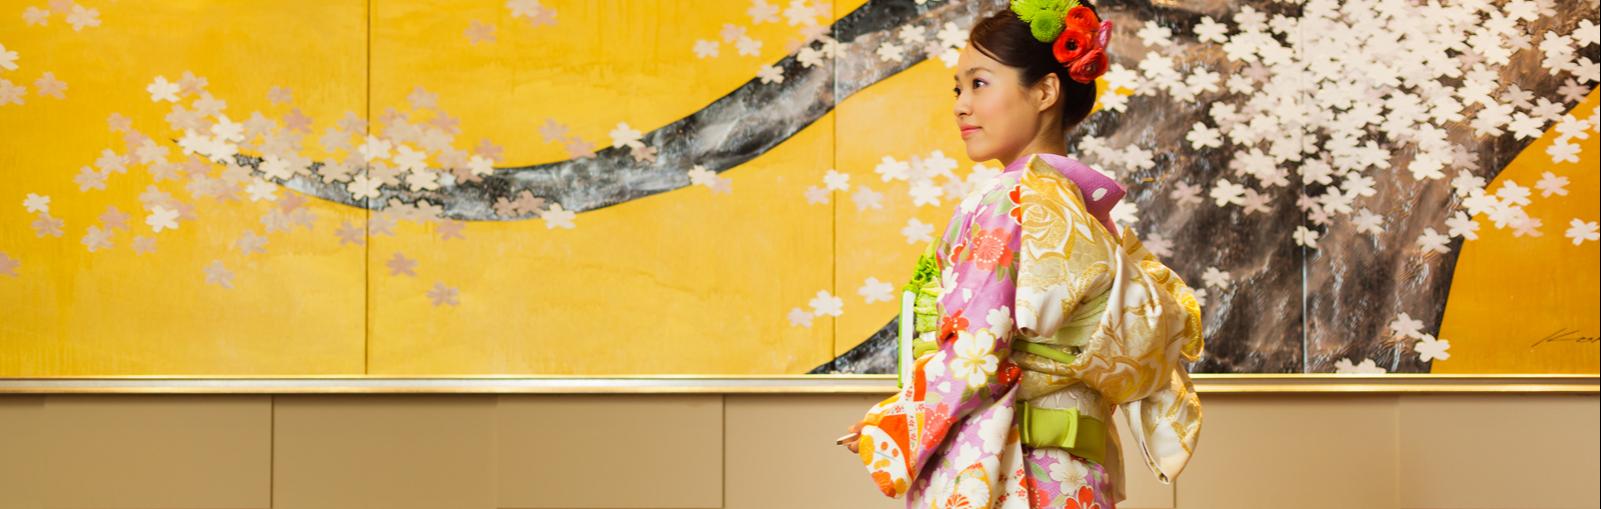 THE SAKURA DINING TOKYO(ザ・サクラダイニングトウキョウ) のカバー画像